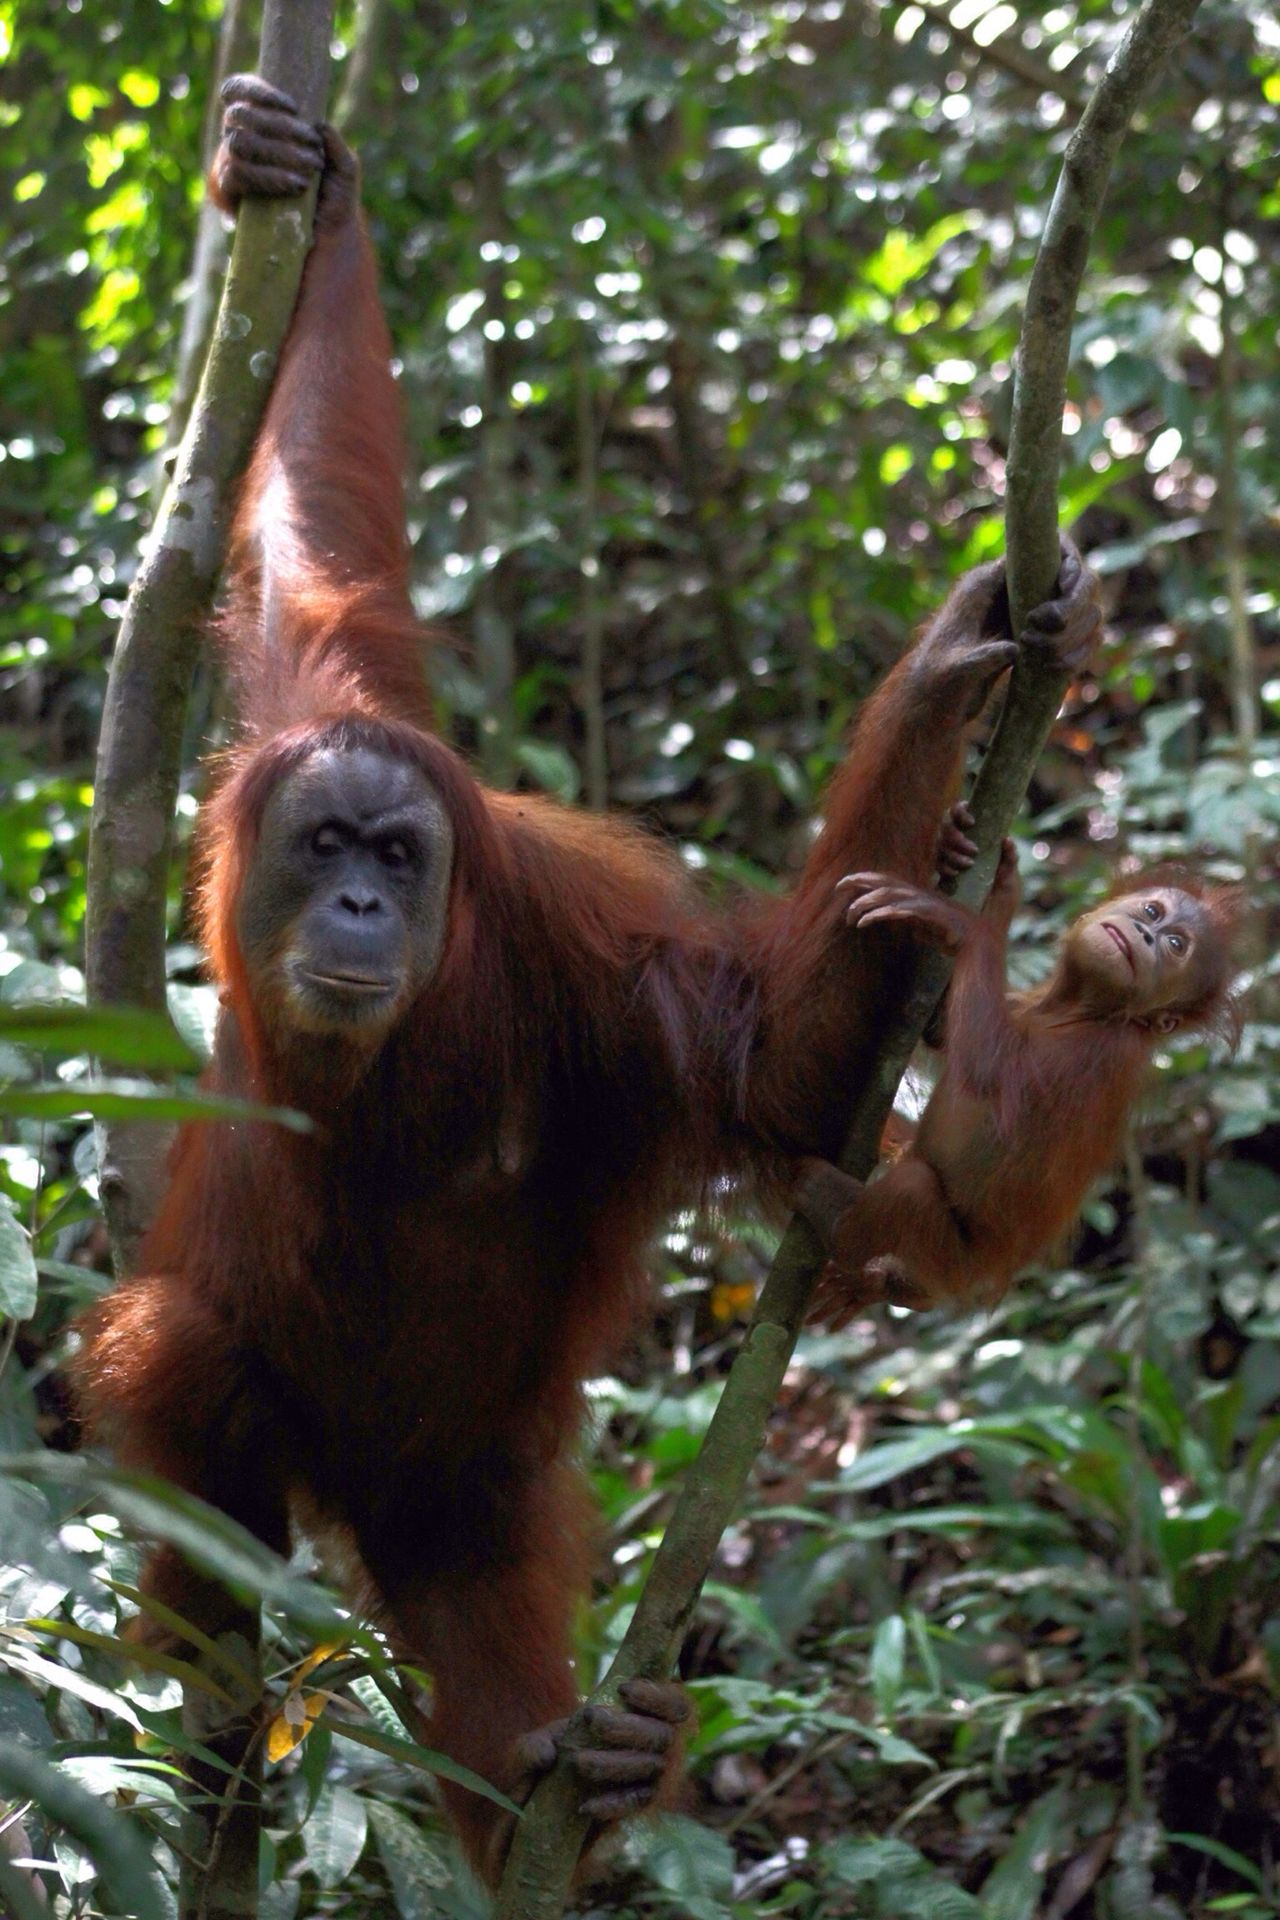 Orangutan Mother and Baby Sumatra  INDONESIA Jungle Trek Wildlife Playing With The Animals Monkey